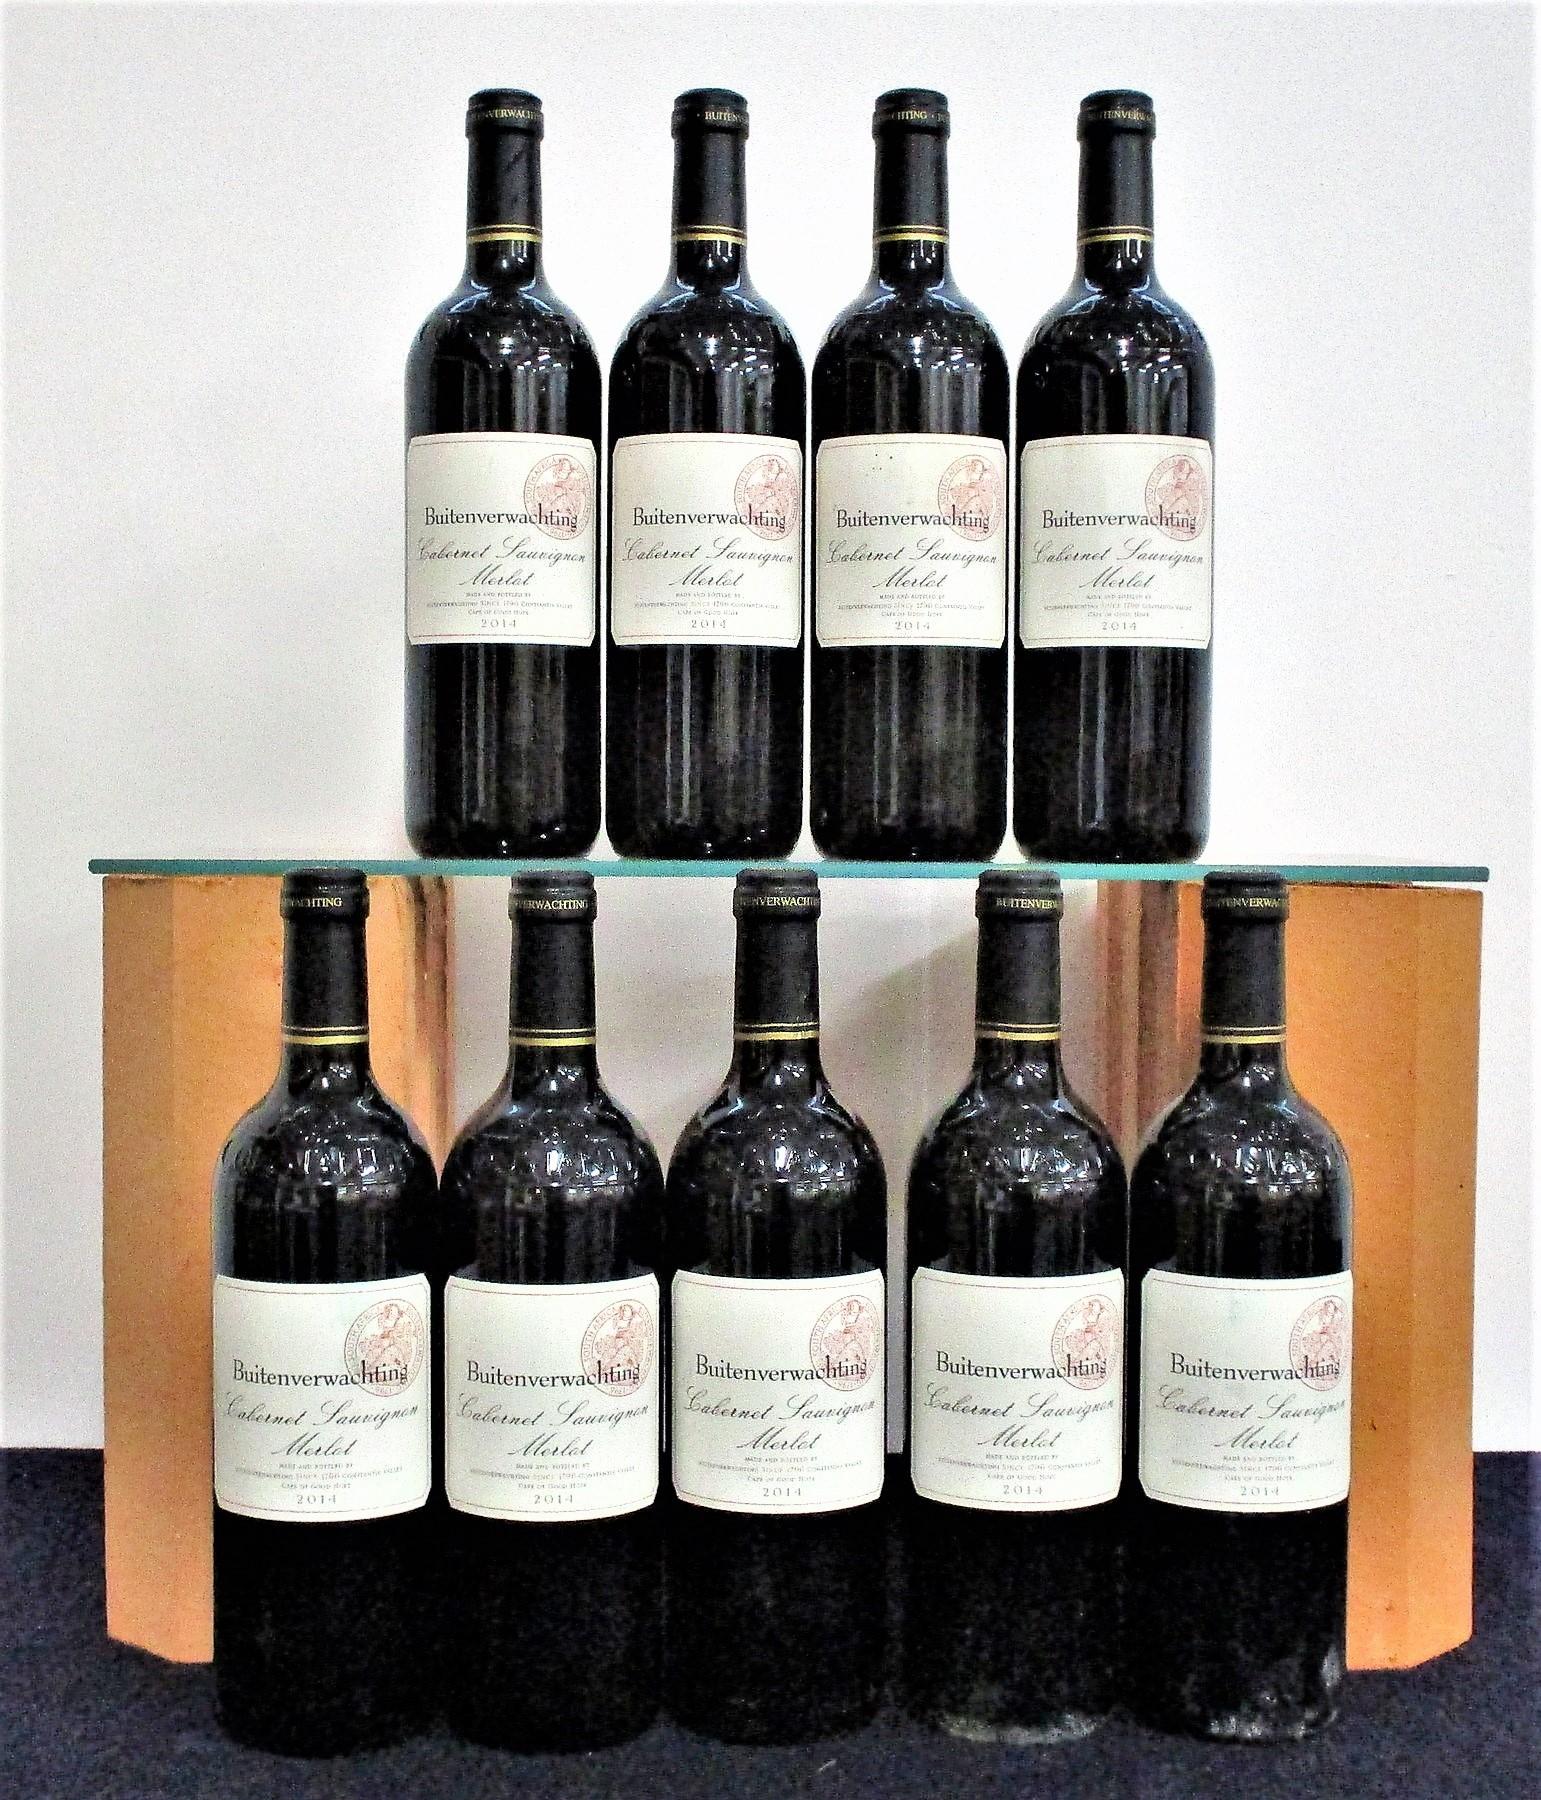 9 bts Buitenverwachting Cabernet Sauvignon Merlot 2014 Above nine bottles